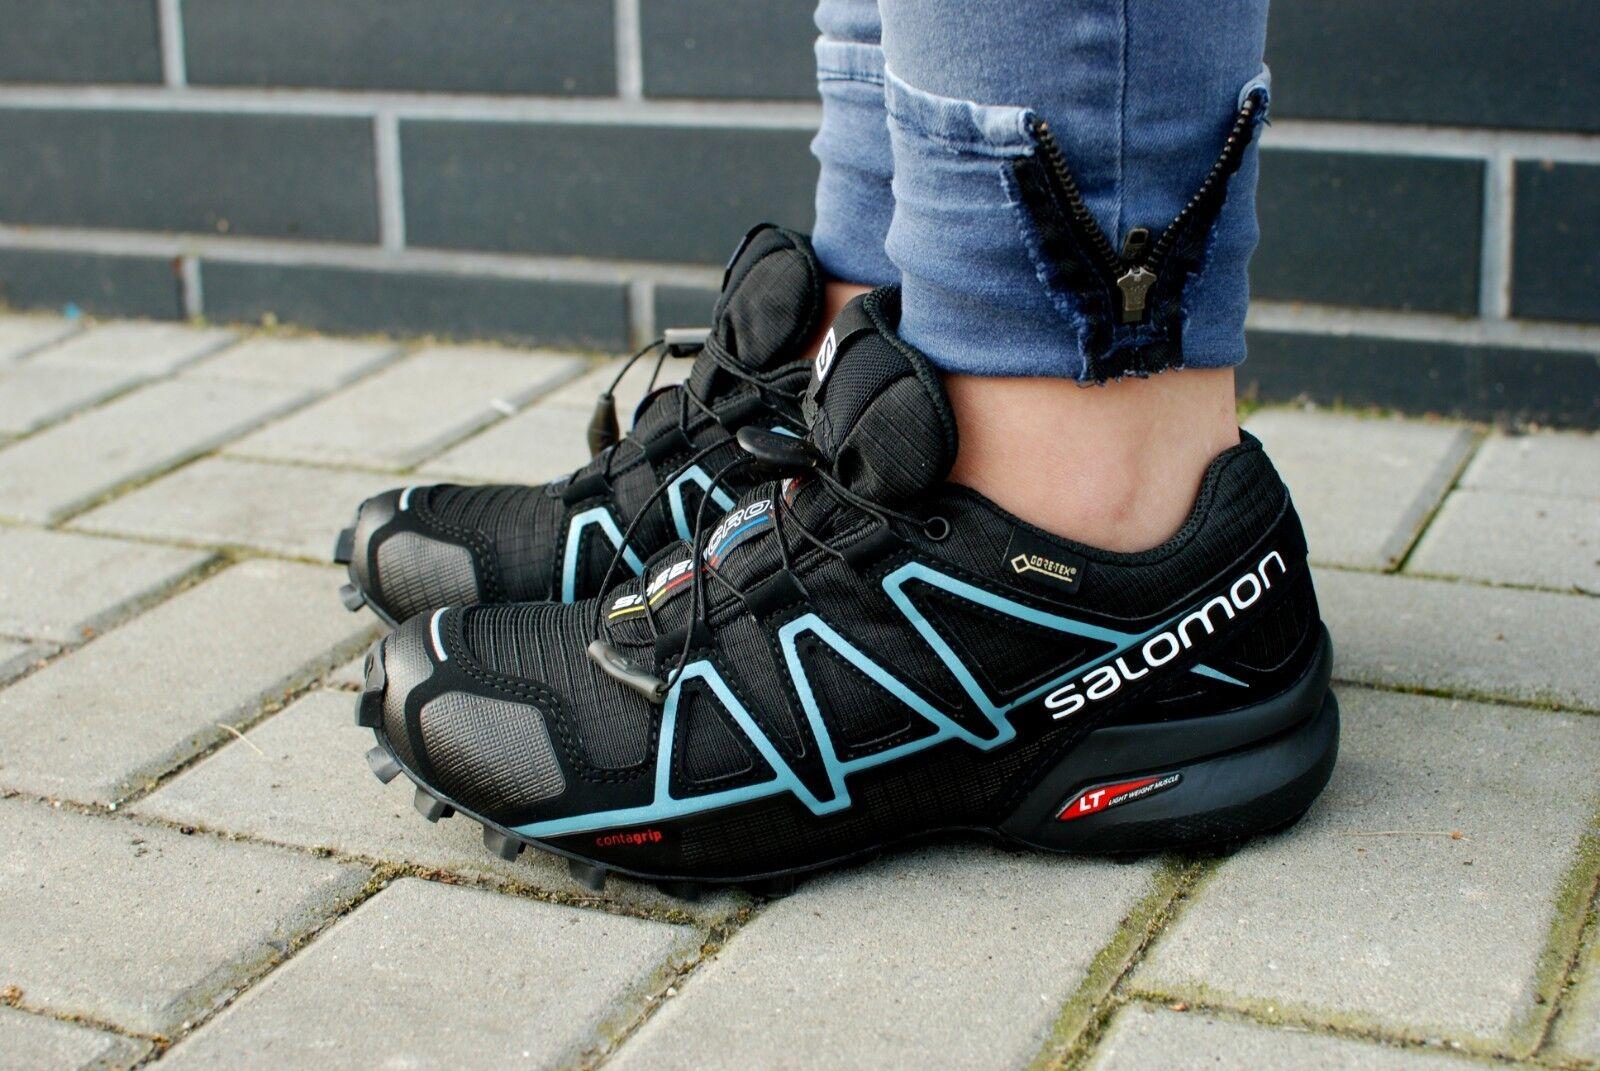 Salomon Speedcross 4 GTX 383187 señora zapatillas calzado deportivo Trail trekking 2018